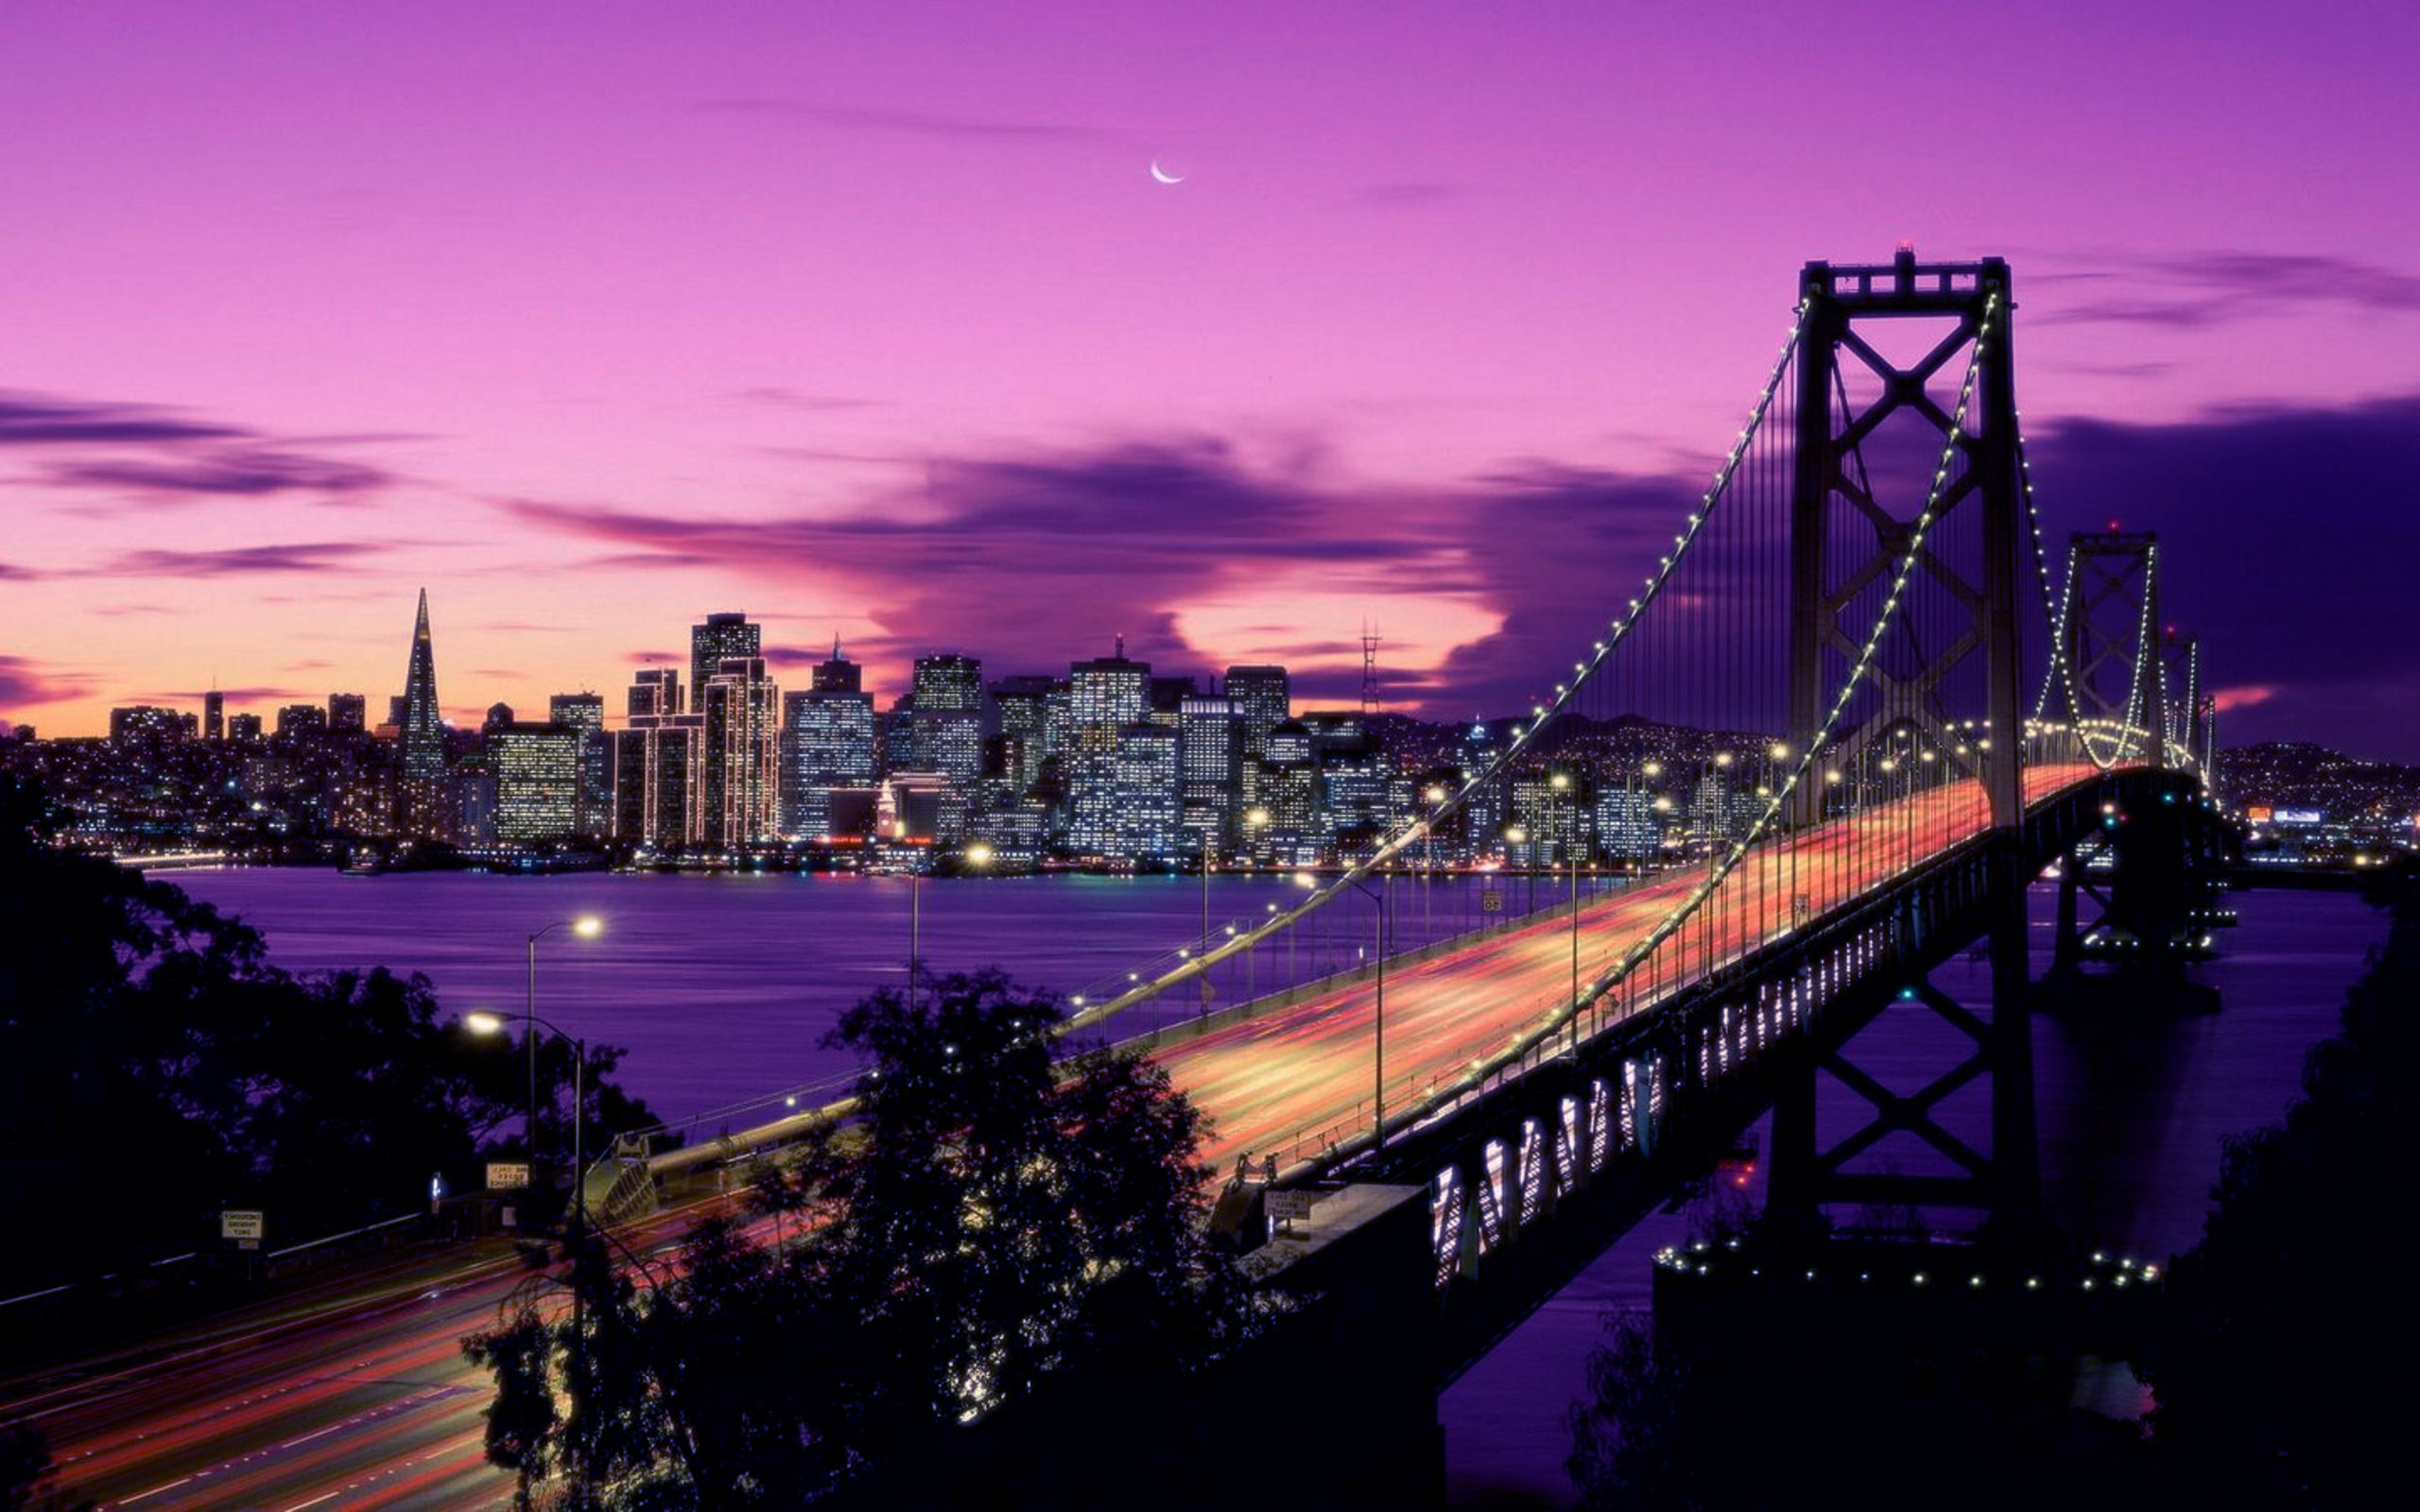 San Francisco HD desktop wallpaper Cities wallpapers 2560x1600